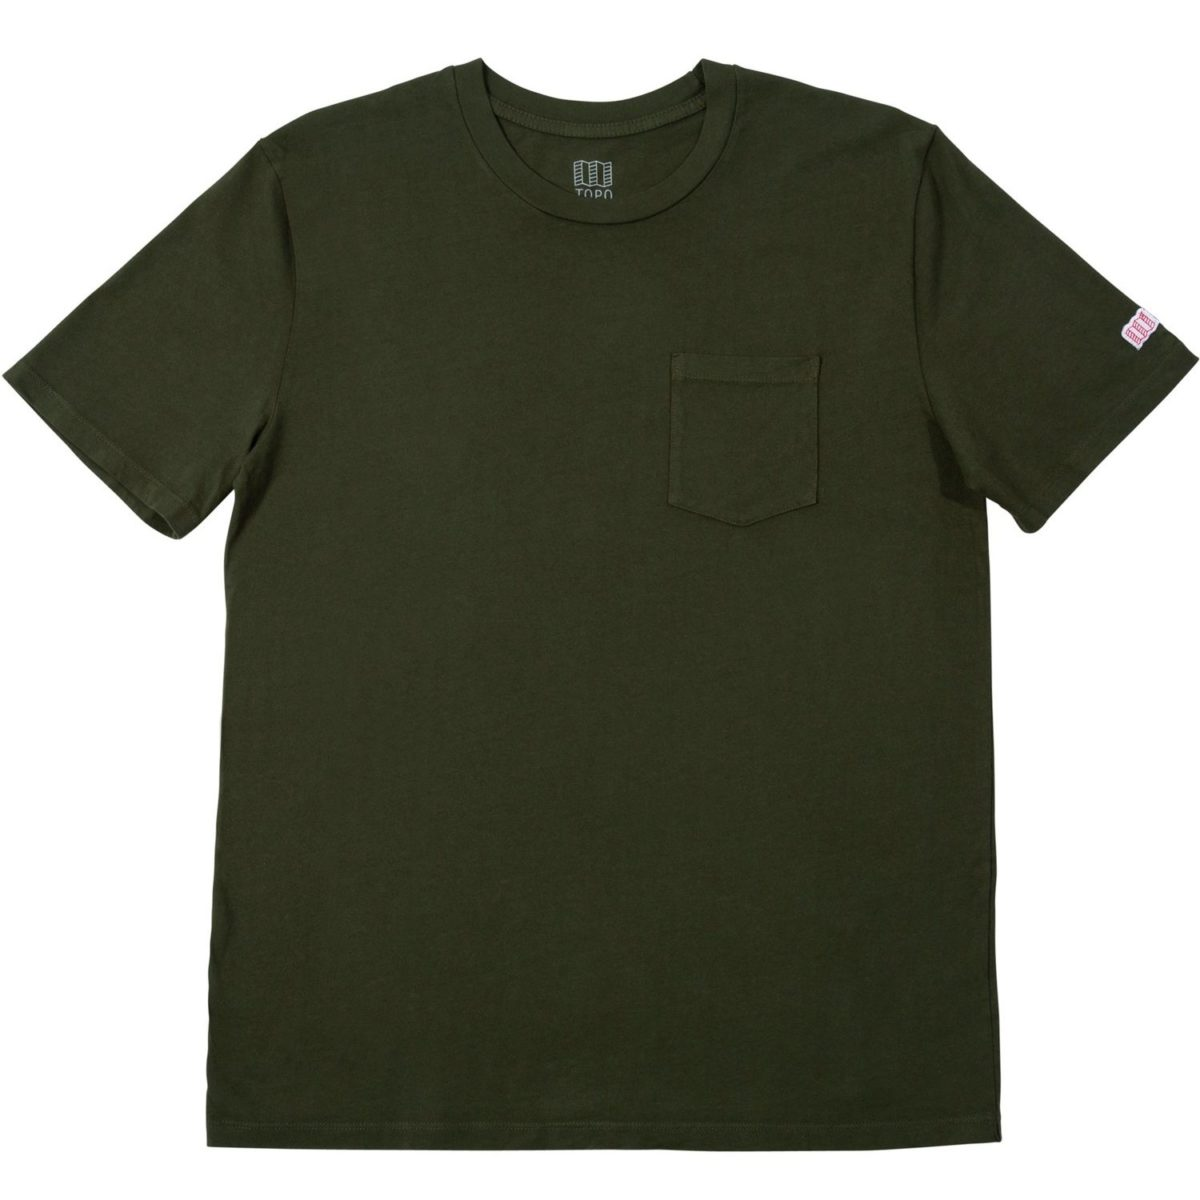 Mammut Trovat T-Shirt Olive PRT2-25/% off!